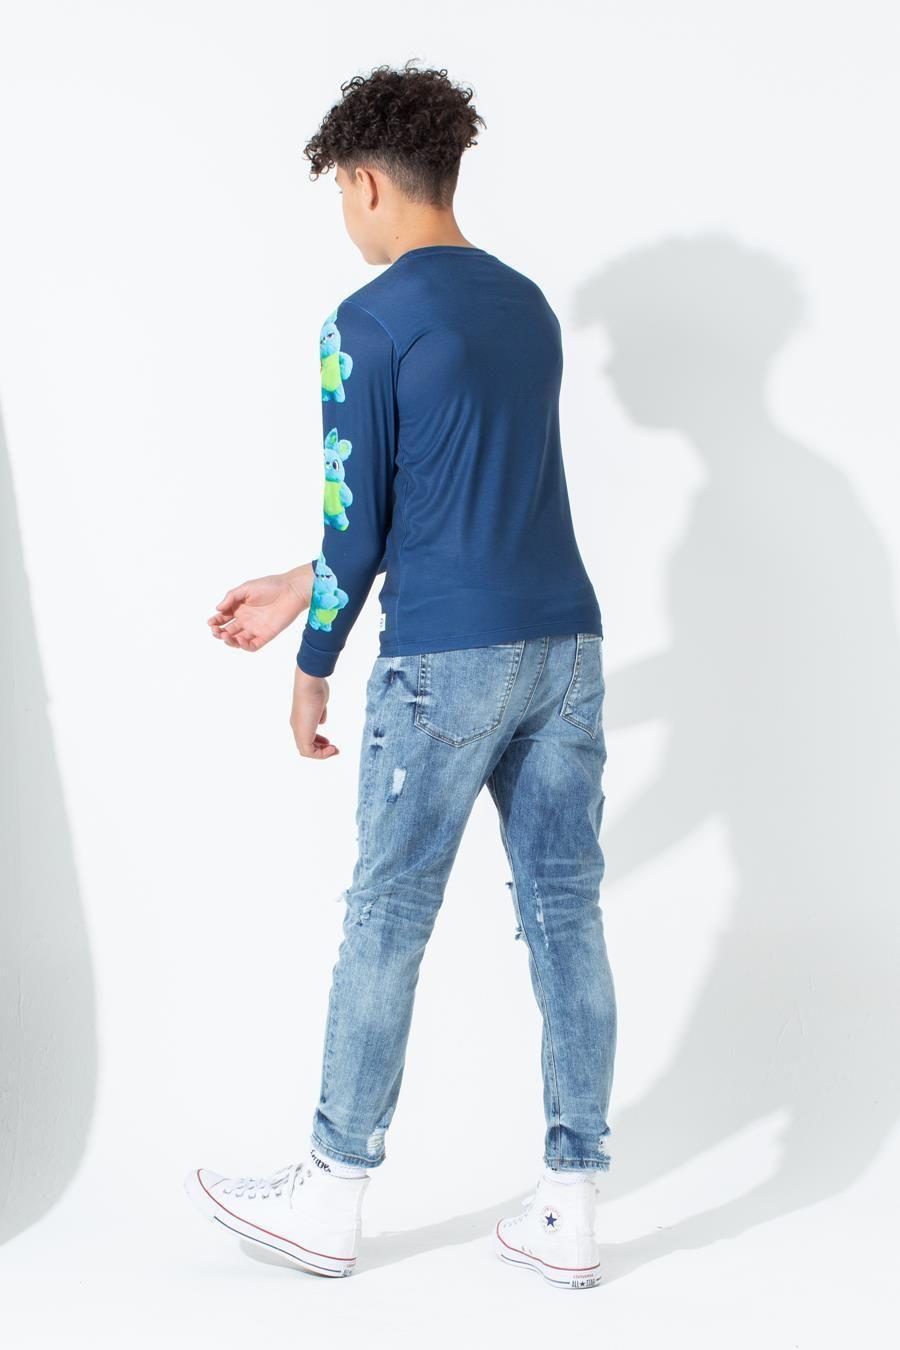 Hype Toy Story Blue Ducky Bunny Kids L/S T-Shirt